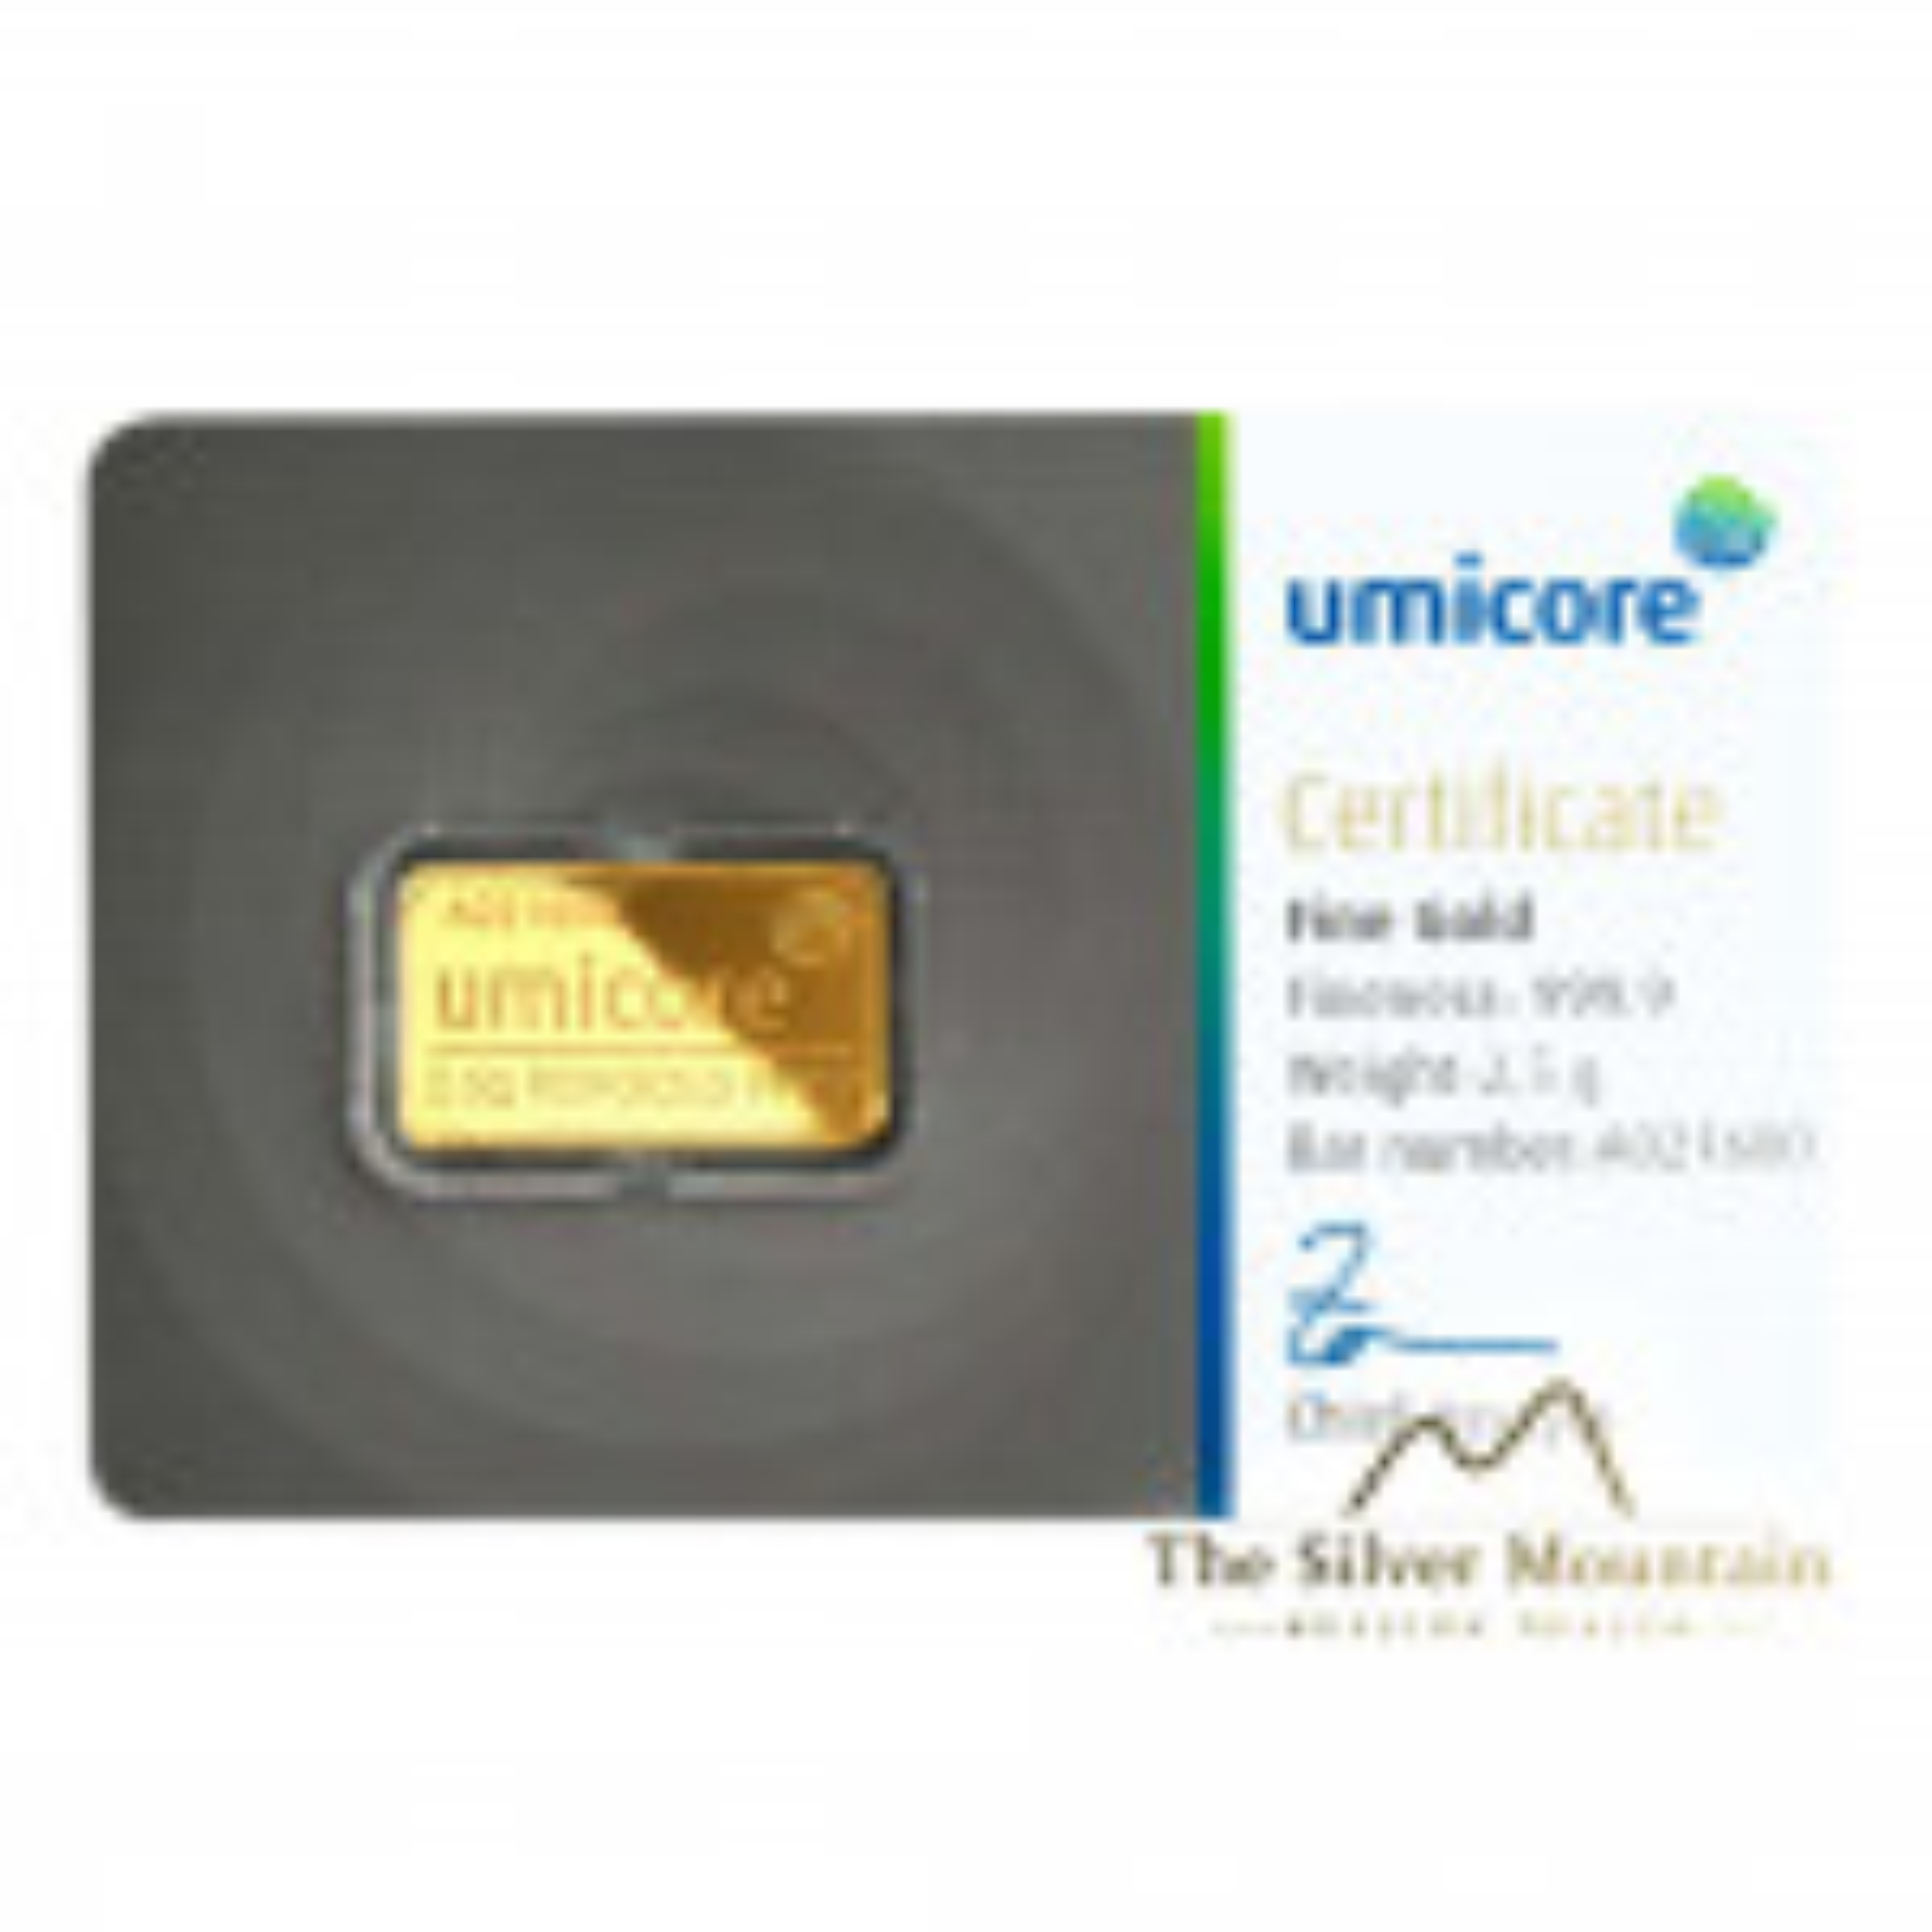 Umicore 2.5 grams goldbar with certificate